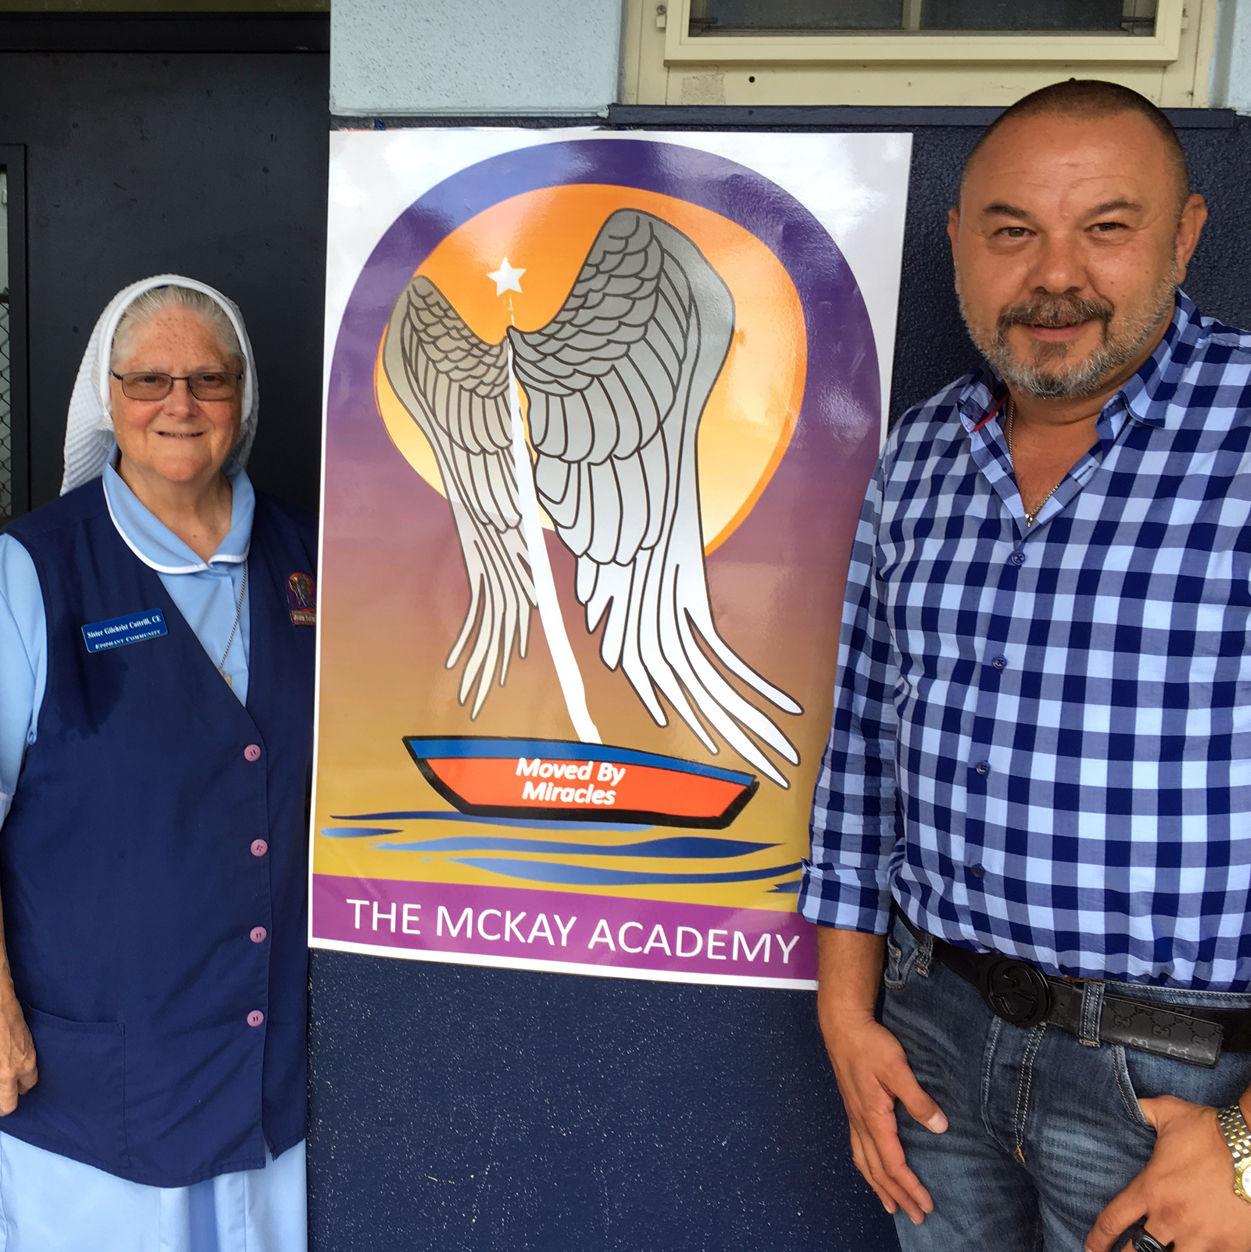 The mckay academy aryrpg